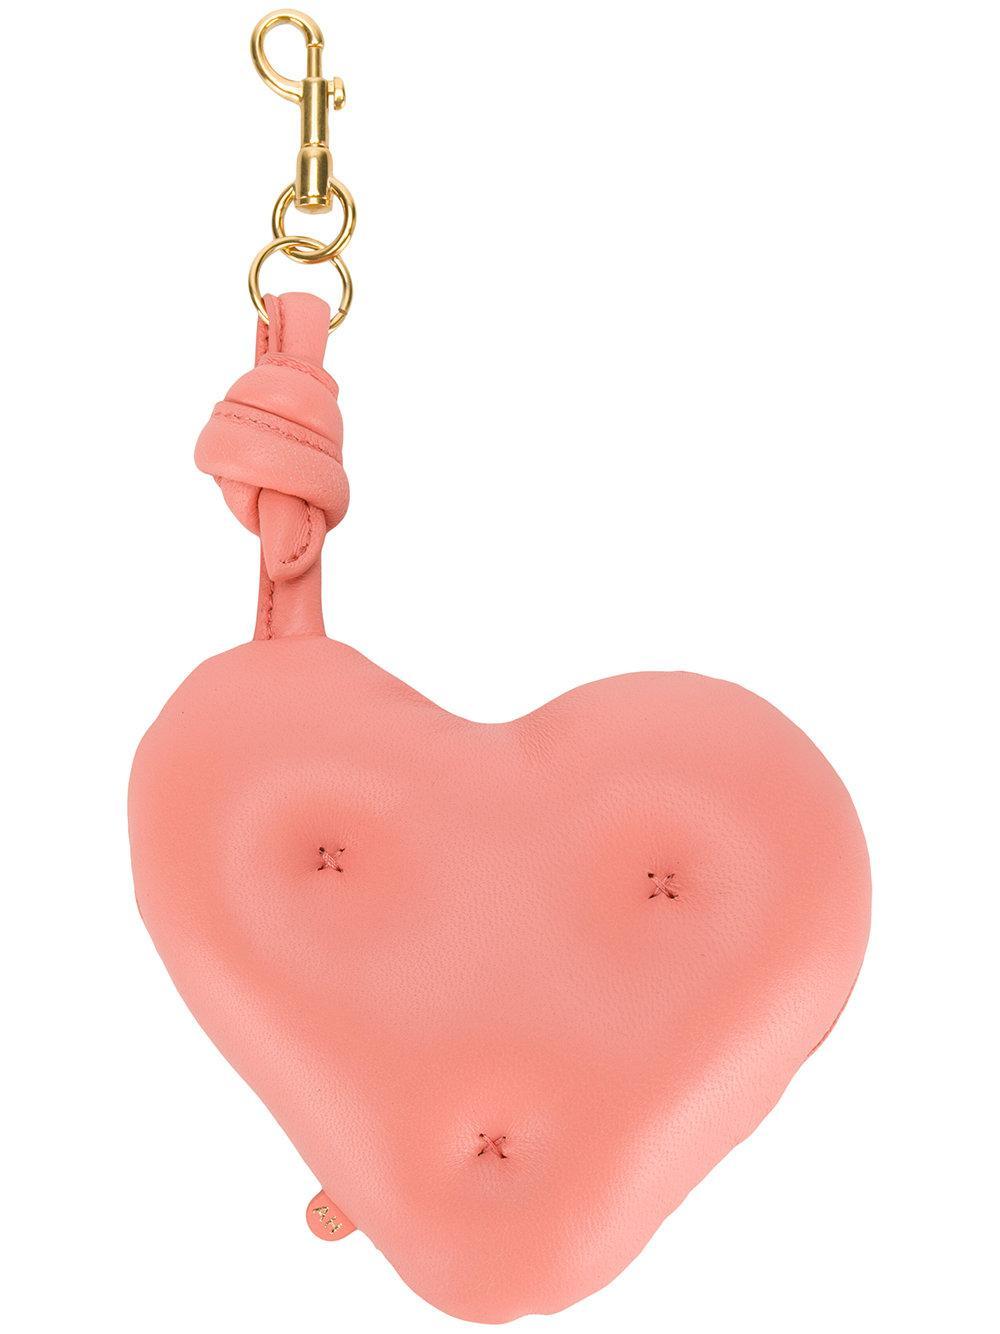 Anya Hindmarch Chubby Heart Charm - Pink